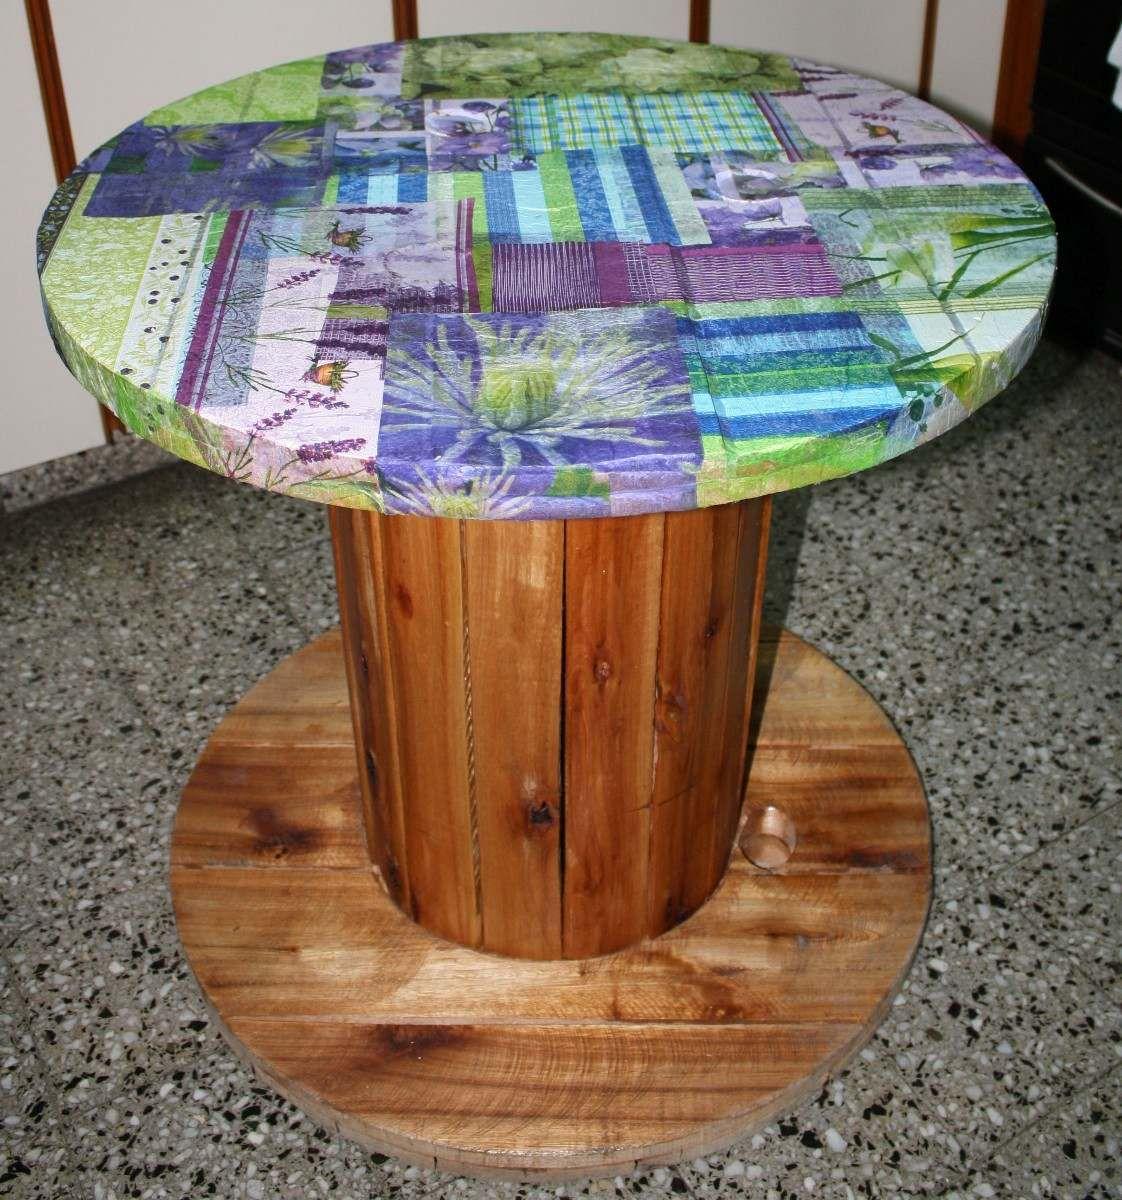 Mesas de madera reciclada buscar con google decoraci n - Mesas madera reciclada ...